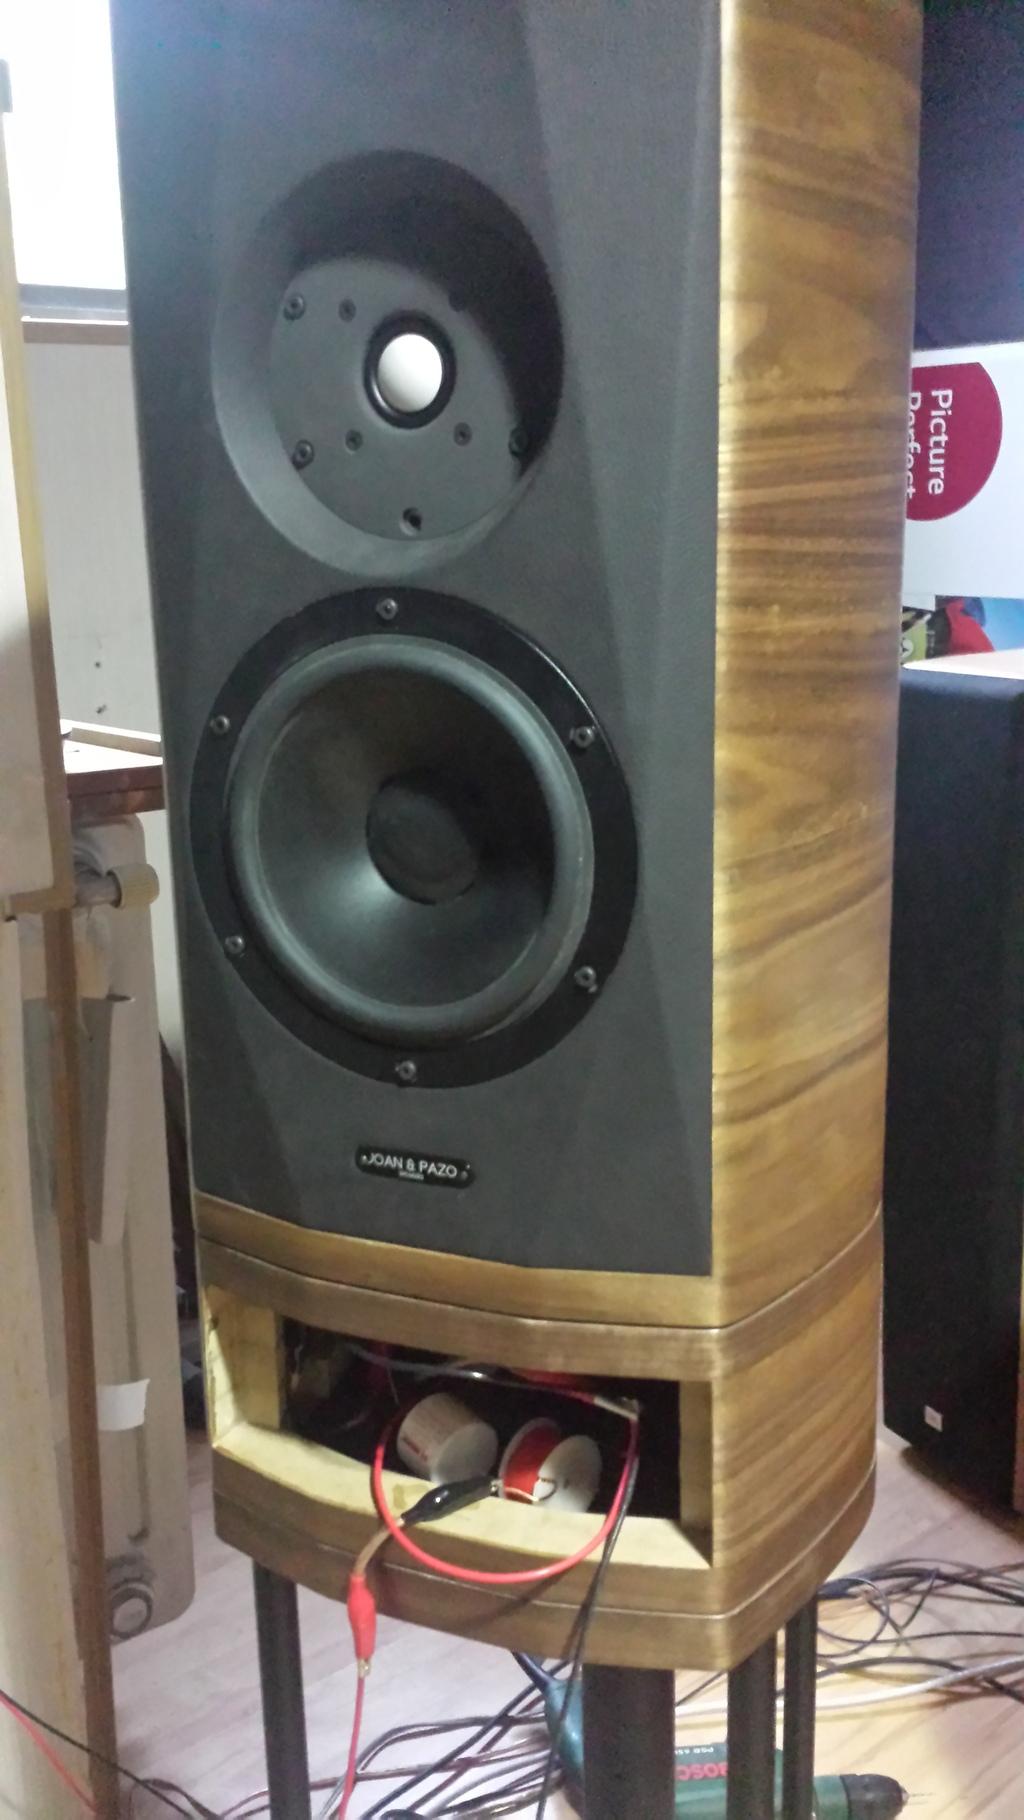 Monitores Audiotechnology C-Quenze 18H521706SD + Seas Excel T29MF001 - Página 6 20150805_080247_zpslsjue4ry